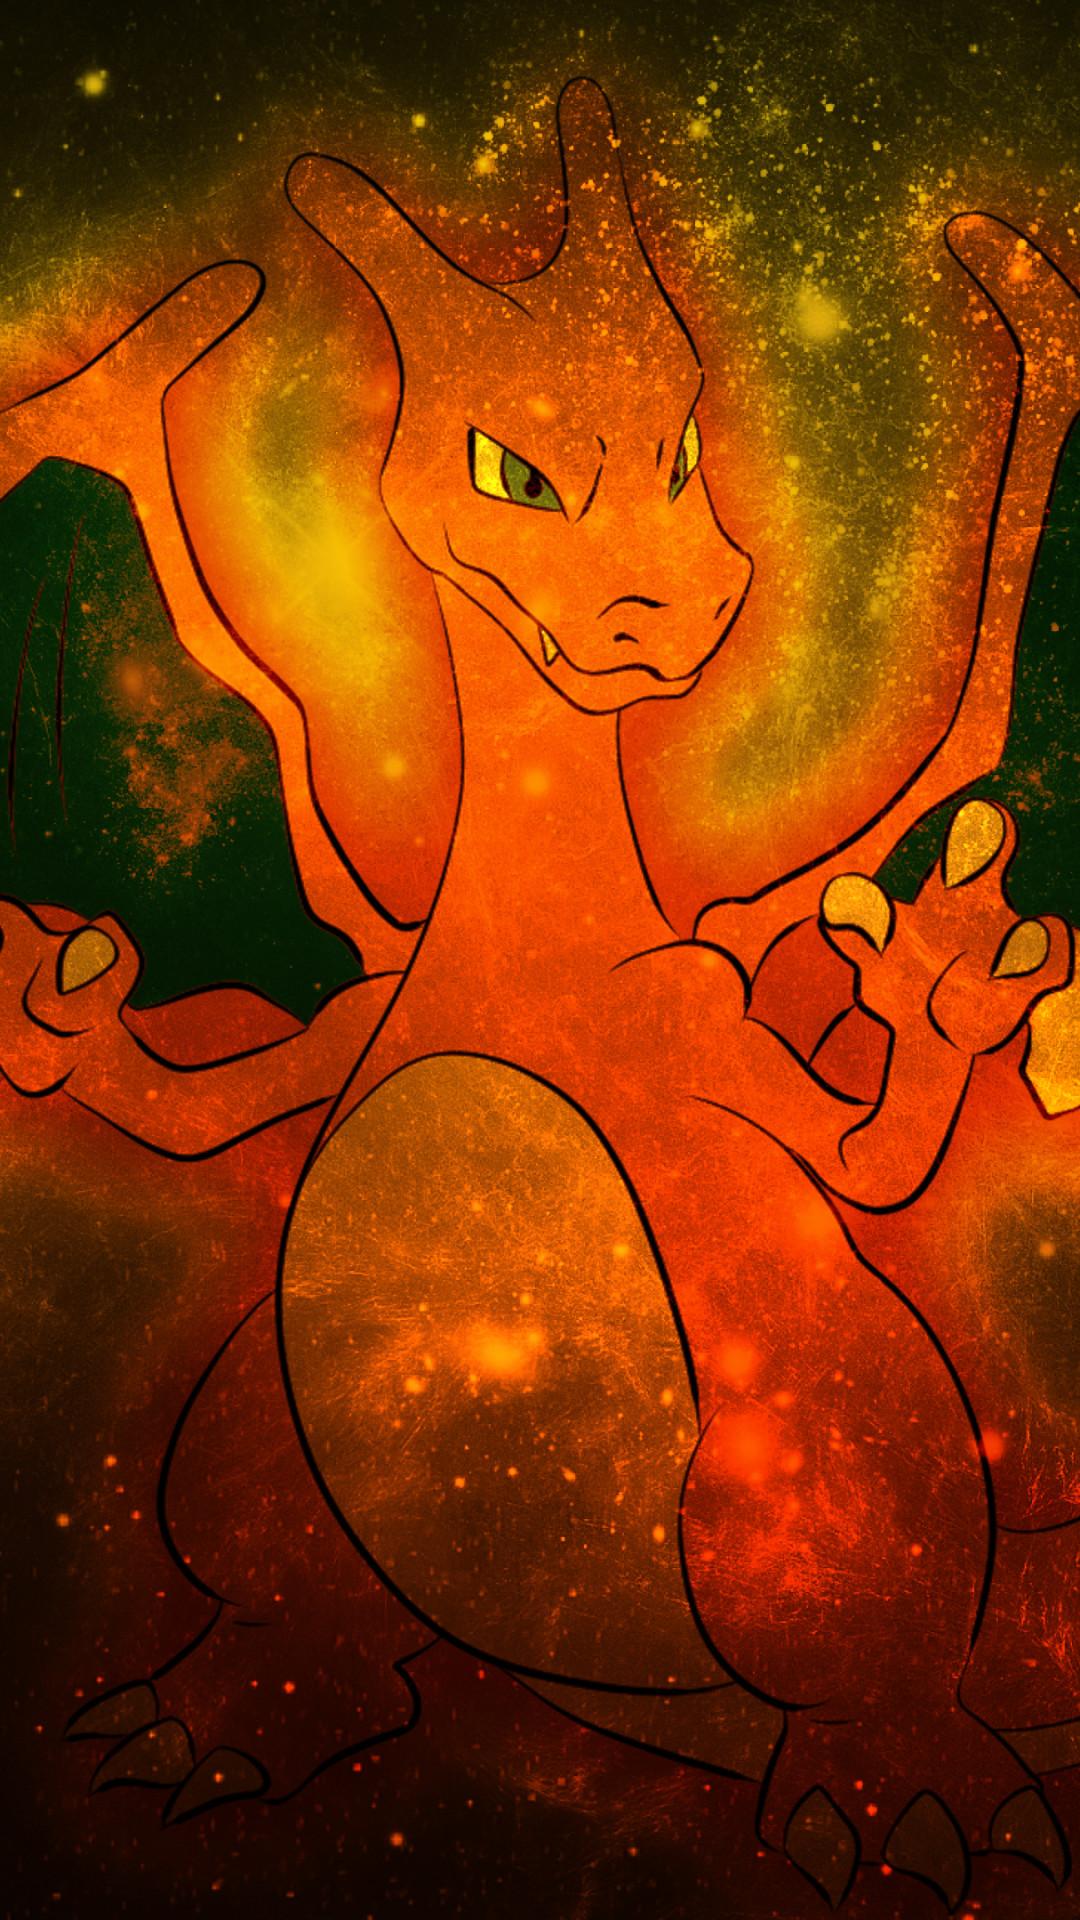 Pokemon Wallpaper Charizard 69 Pictures